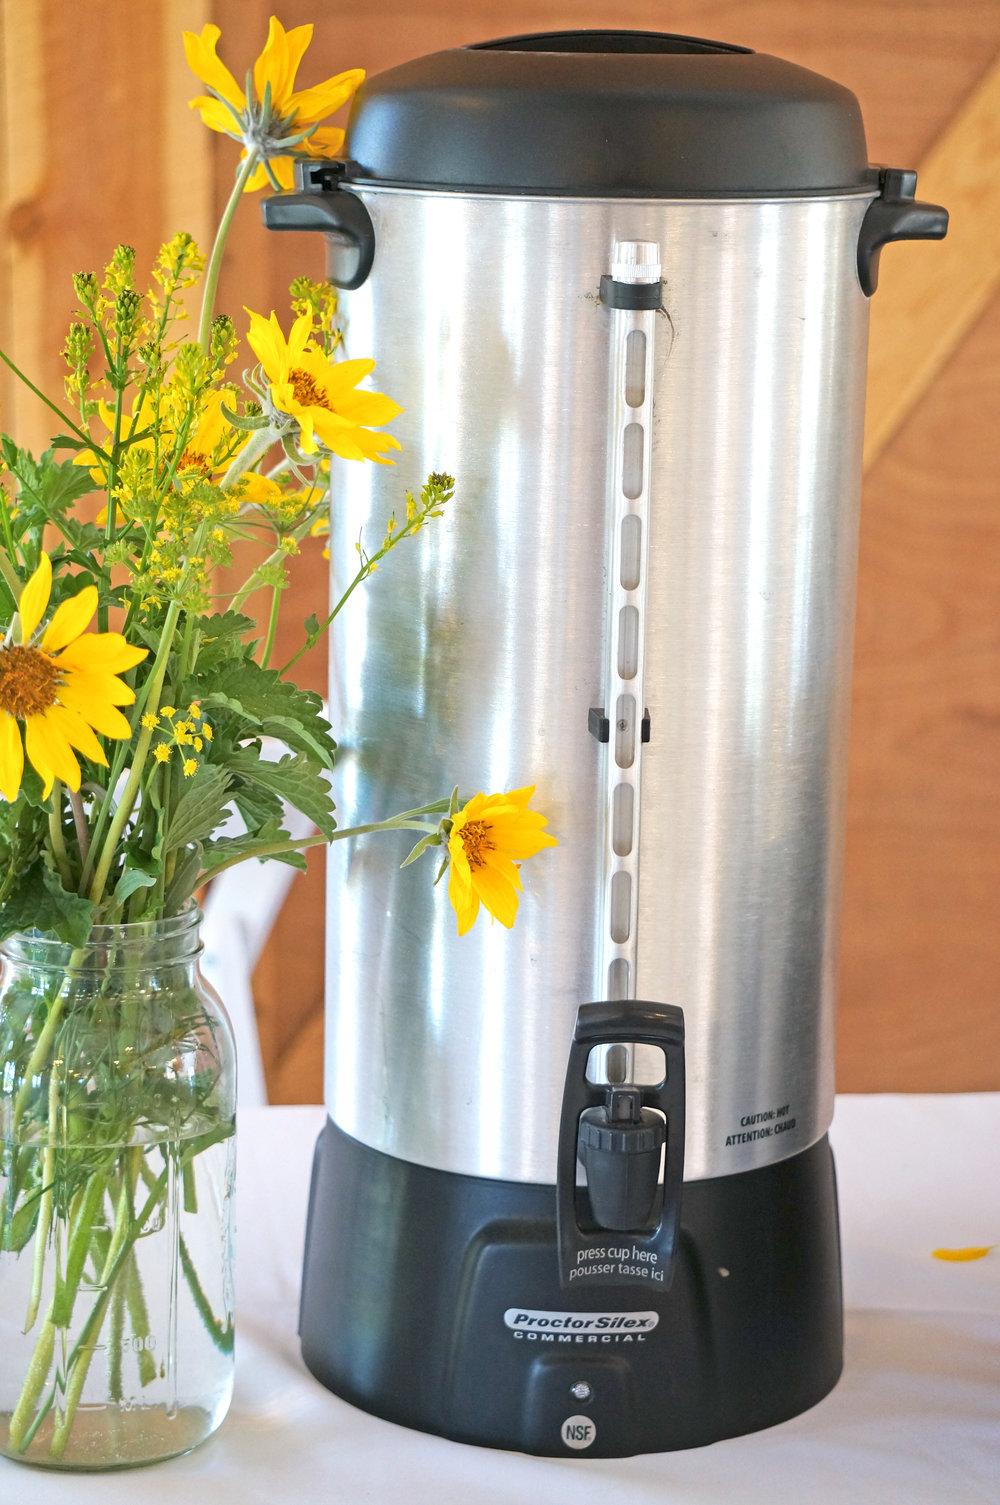 100 cup Coffee Urn - $20